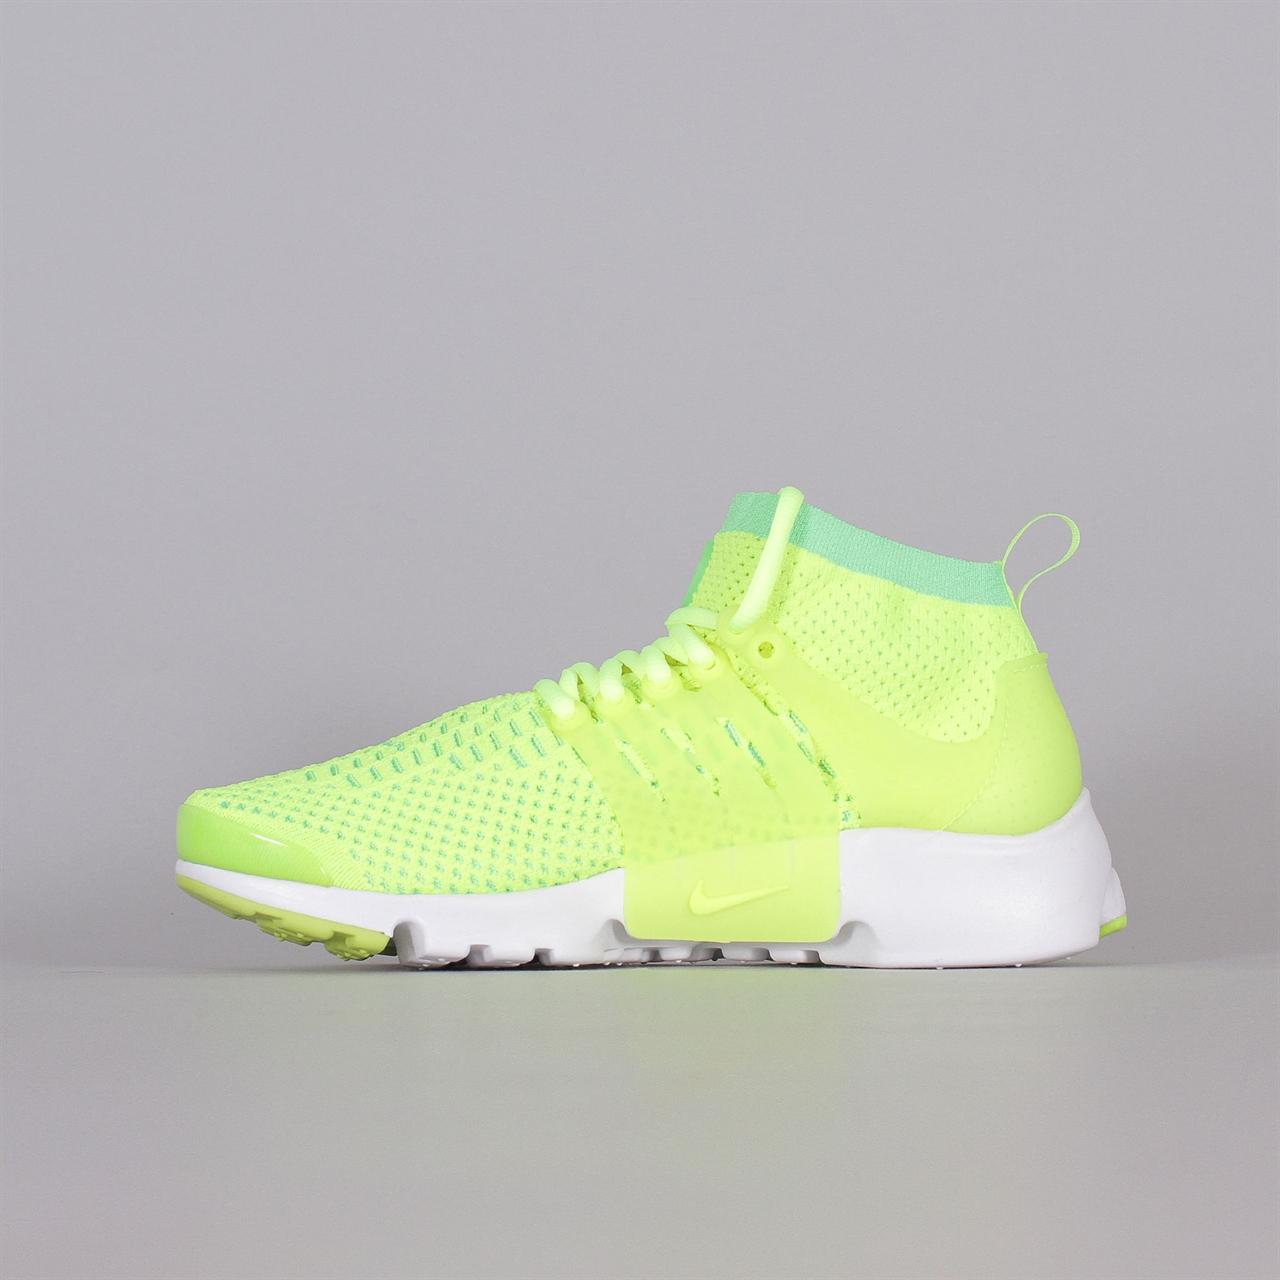 db0f3ac74e5785 Shelta - Nike Sportswear Womens Air Presto Ultra Flyknit (835738-300)